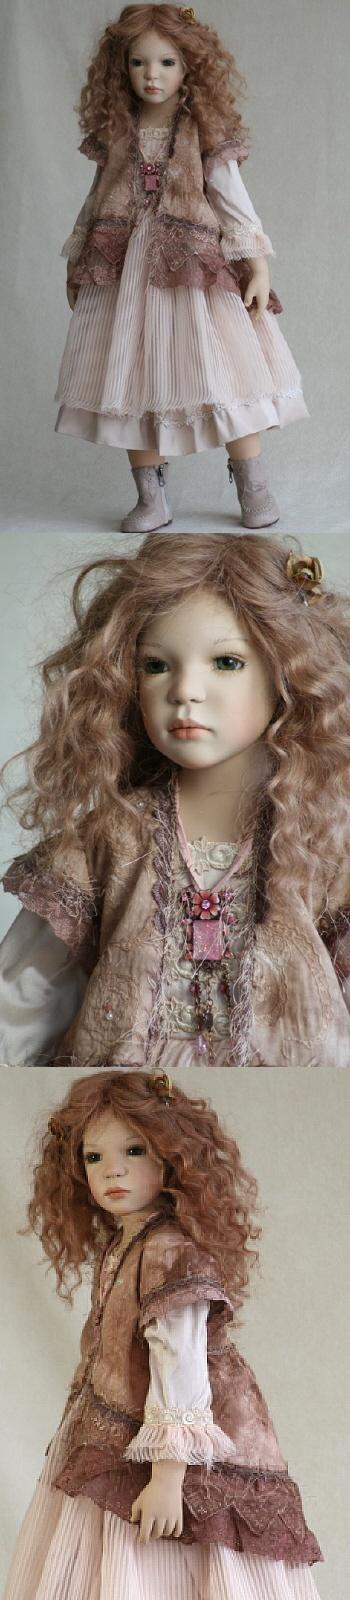 "Zawieruszynski - ""Debbie"" - 2010  30 inches tall Vinyl Doll - LE -"